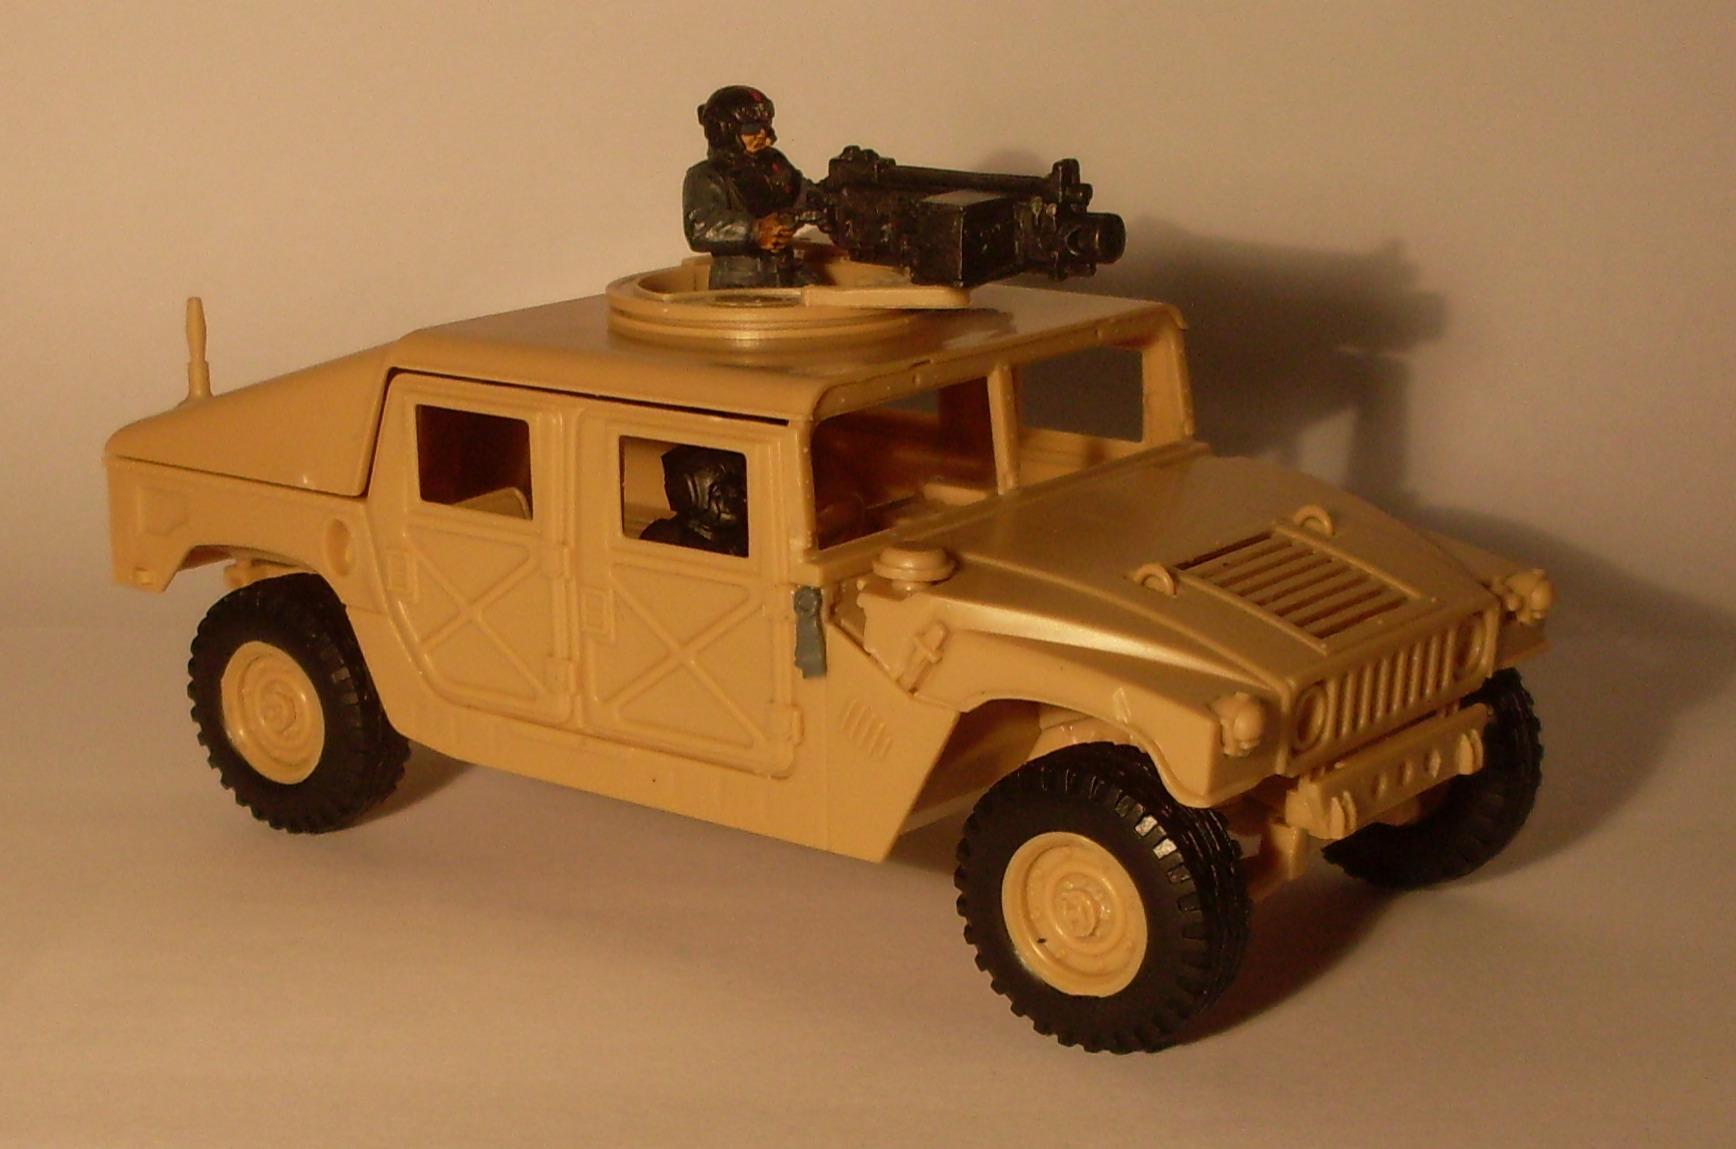 Chimera, Hummer, Humvee, Imperial Guard, Tank